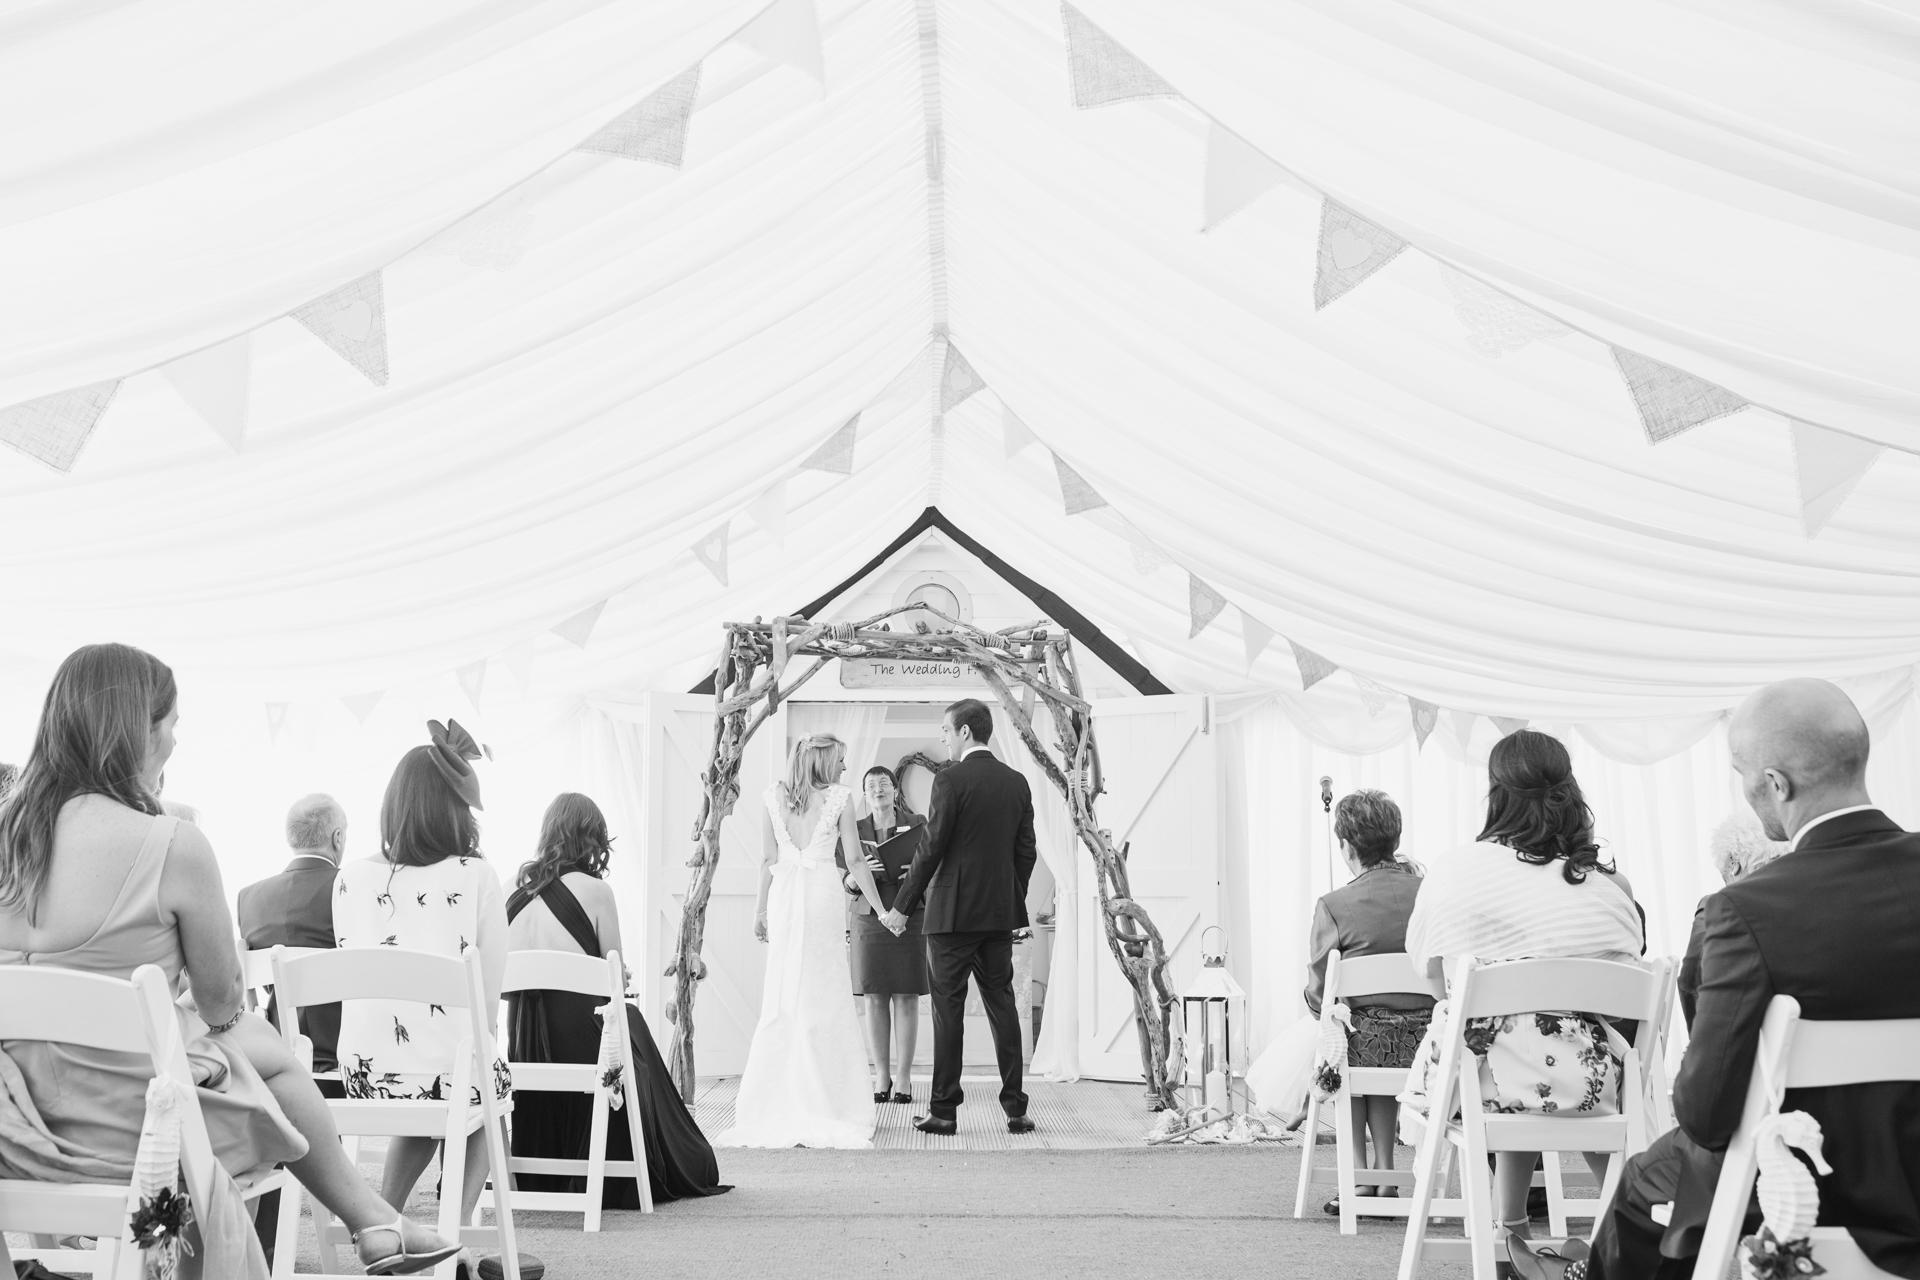 bournemouth beach wedding venue